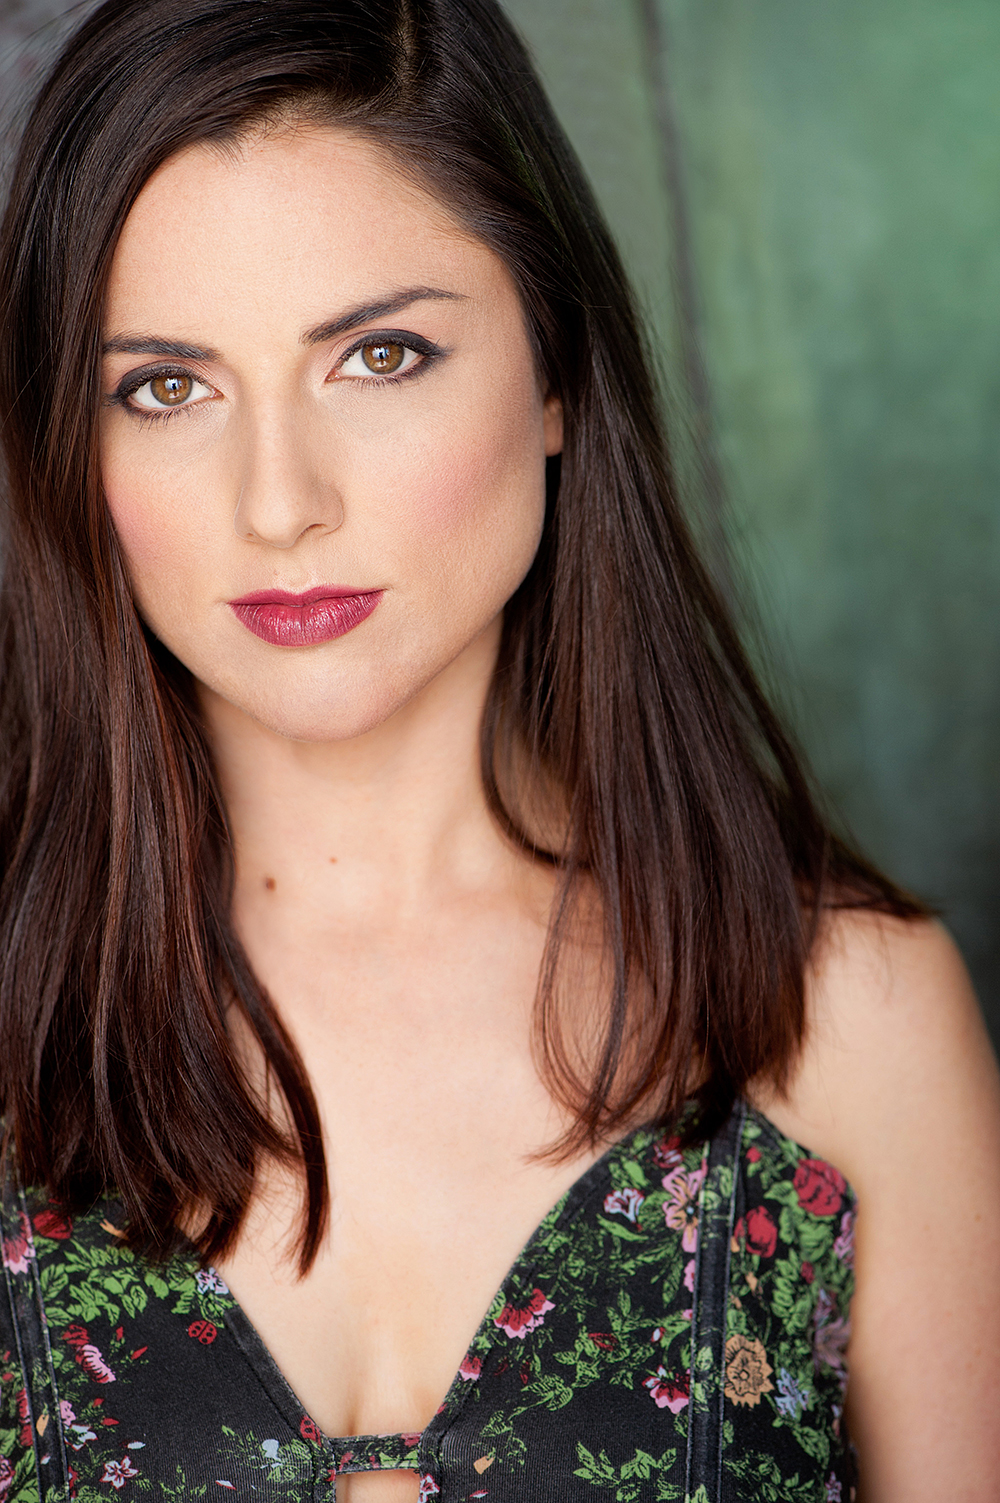 Samantha-Aneson-headshot-1.jpg